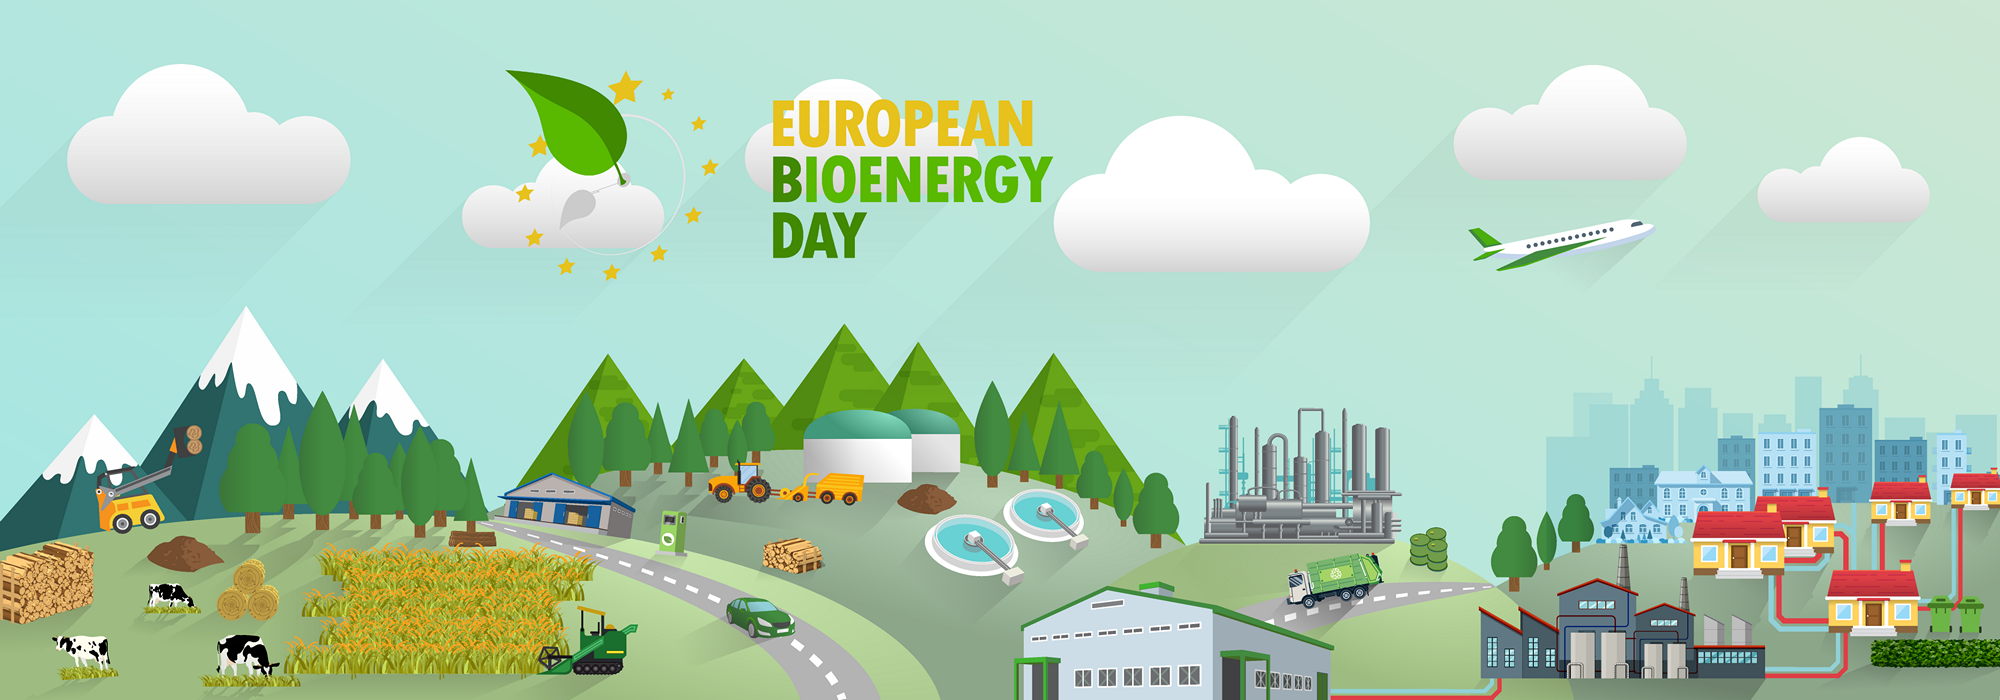 bioenergyday.png